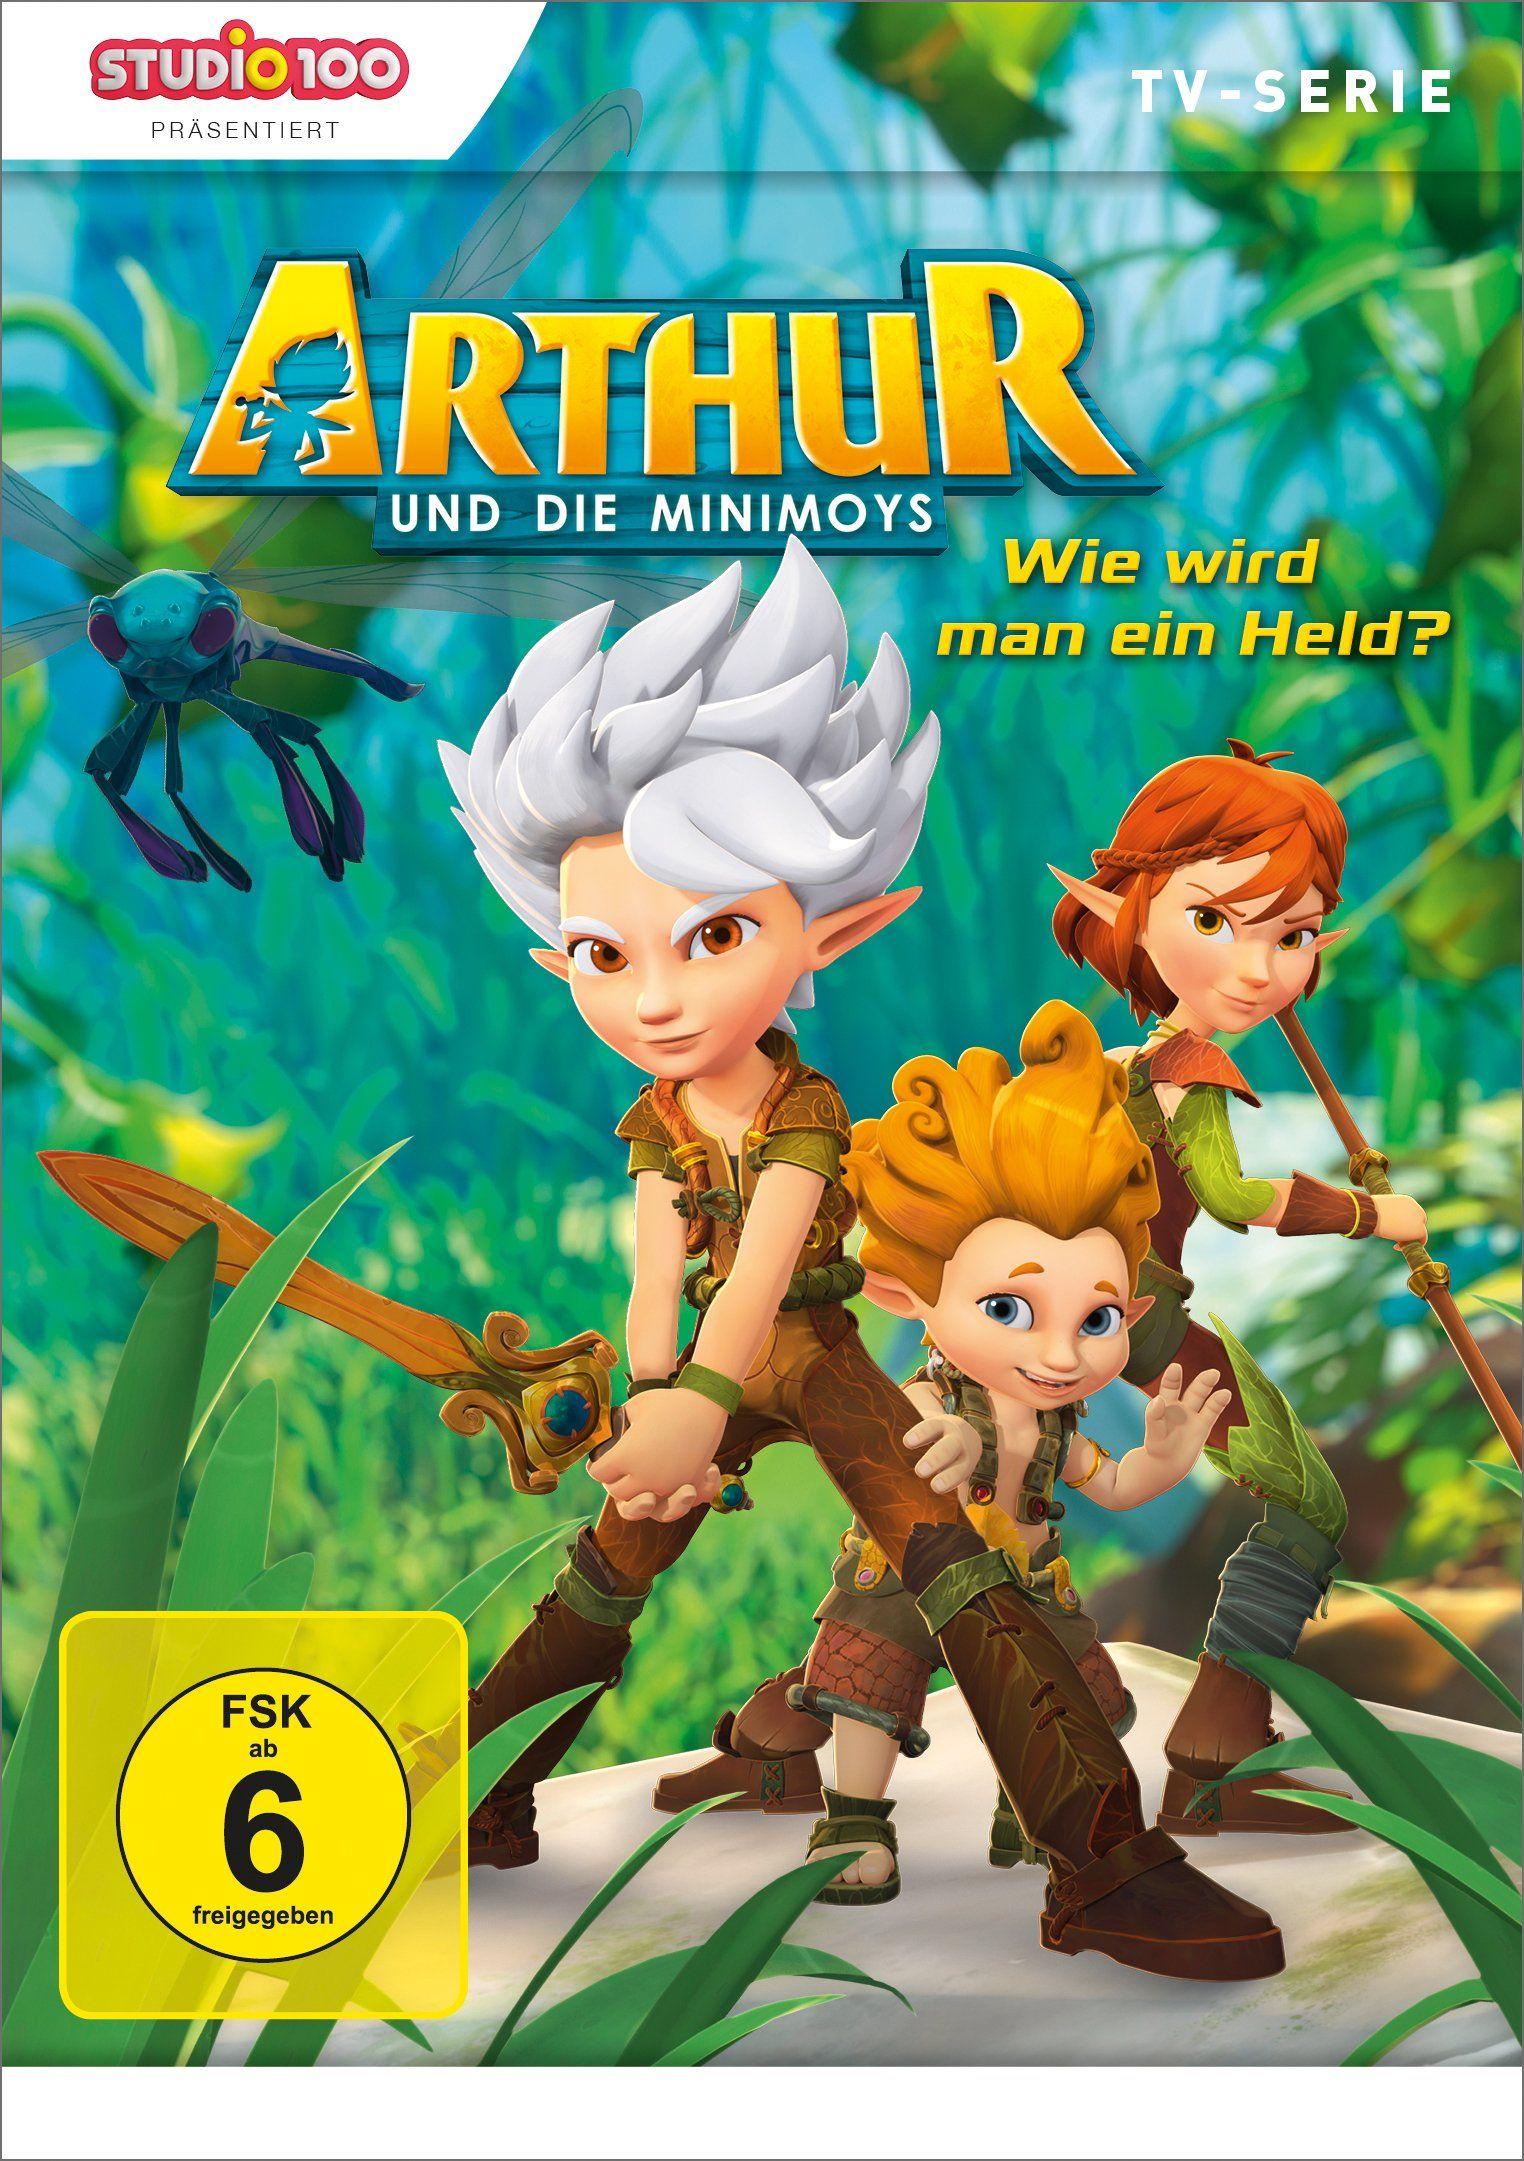 Arthur und die Minimoys 2 | German DVD Covers